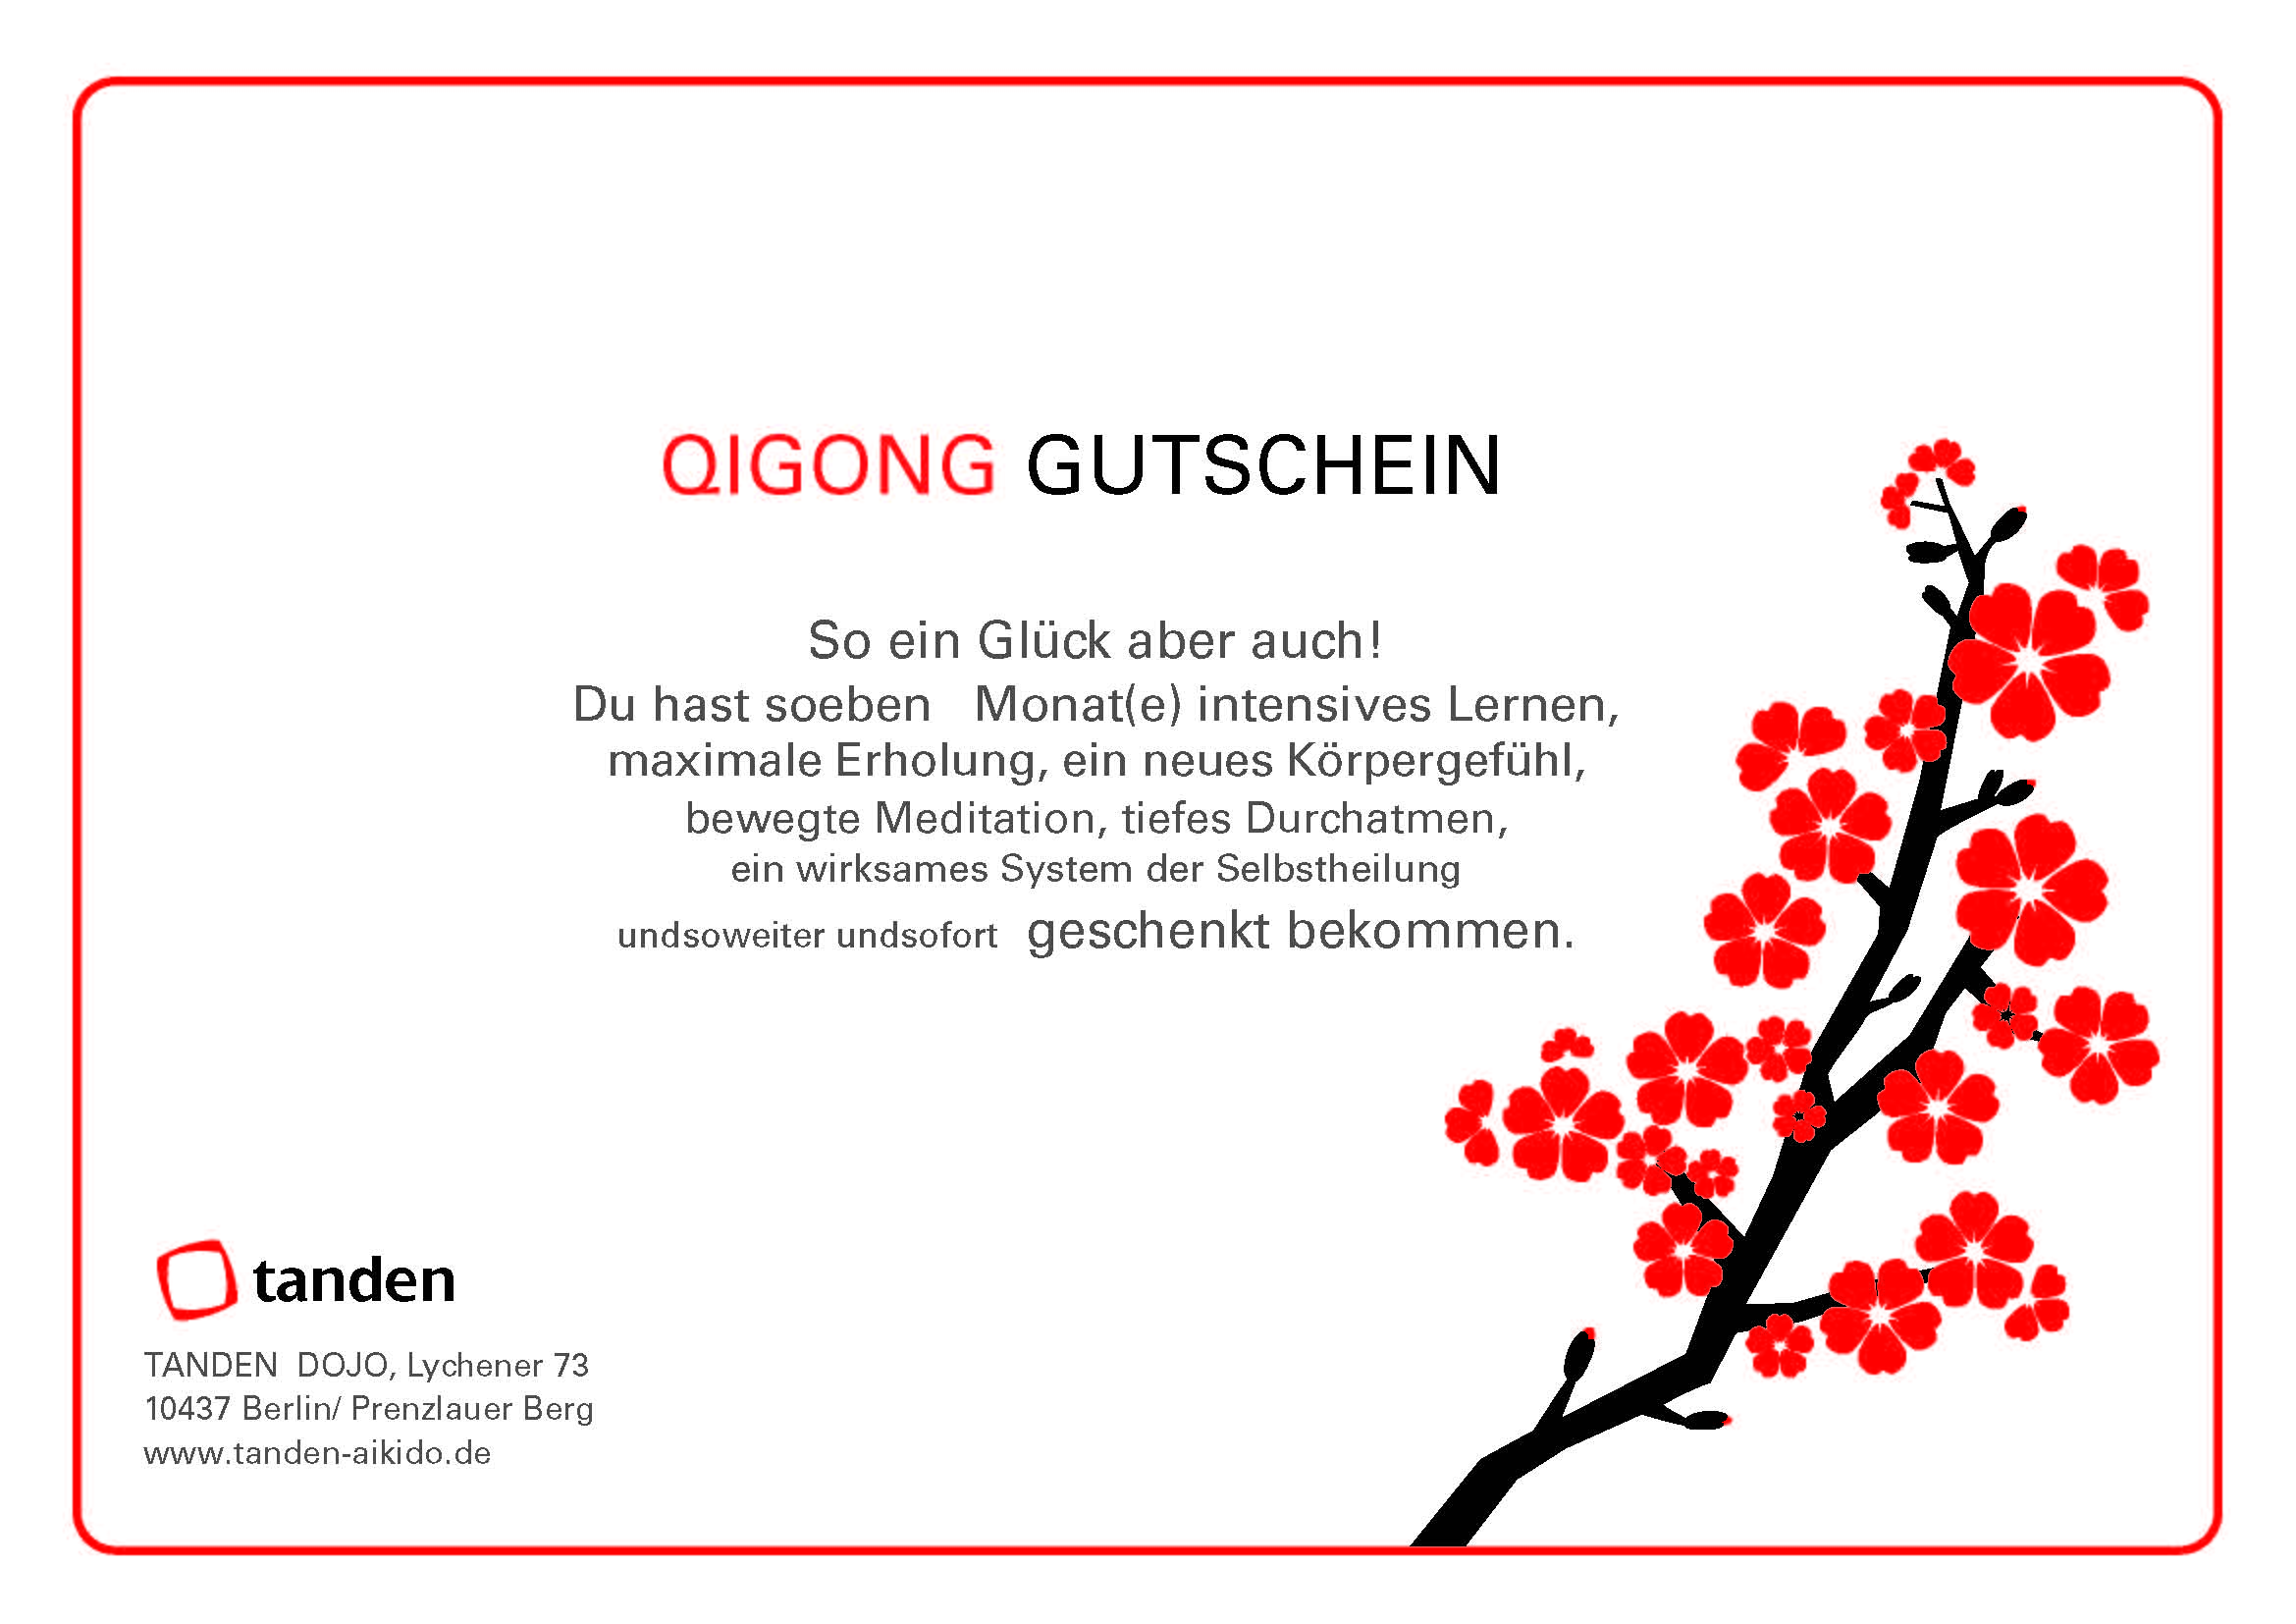 Gutschein Qigong - Tanden Dojo Berlin